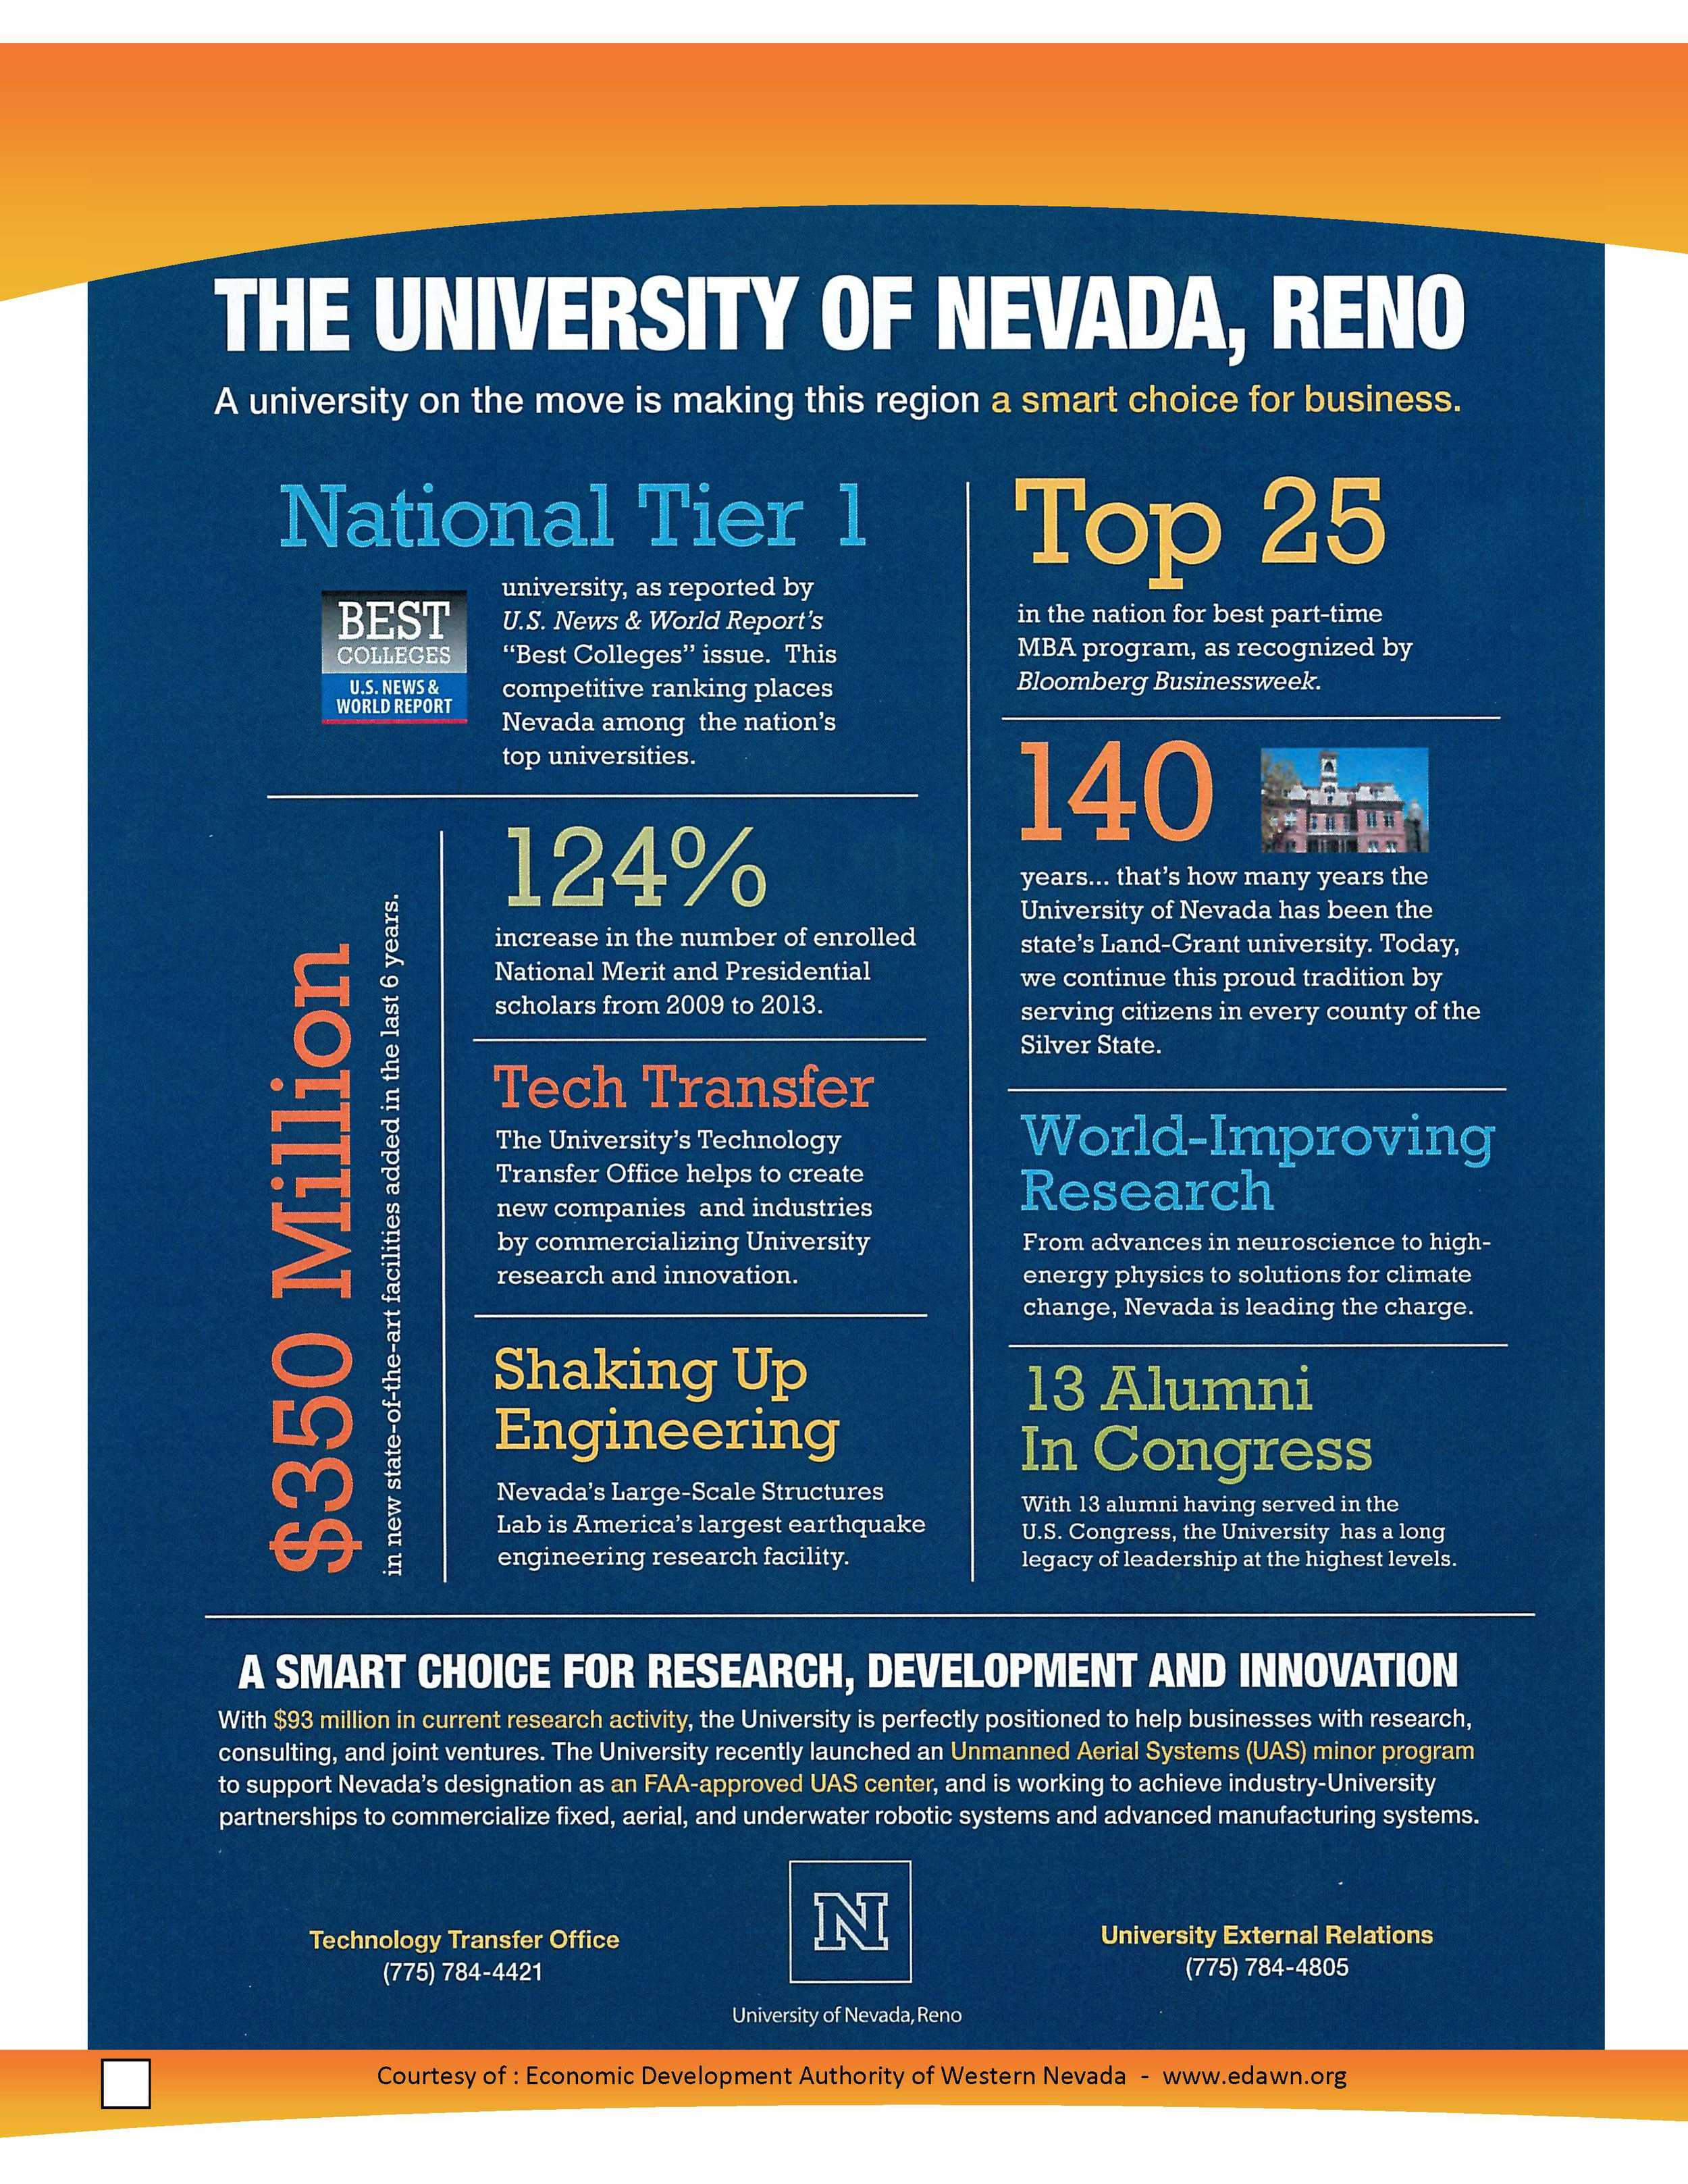 University of Nevada 2.jpg